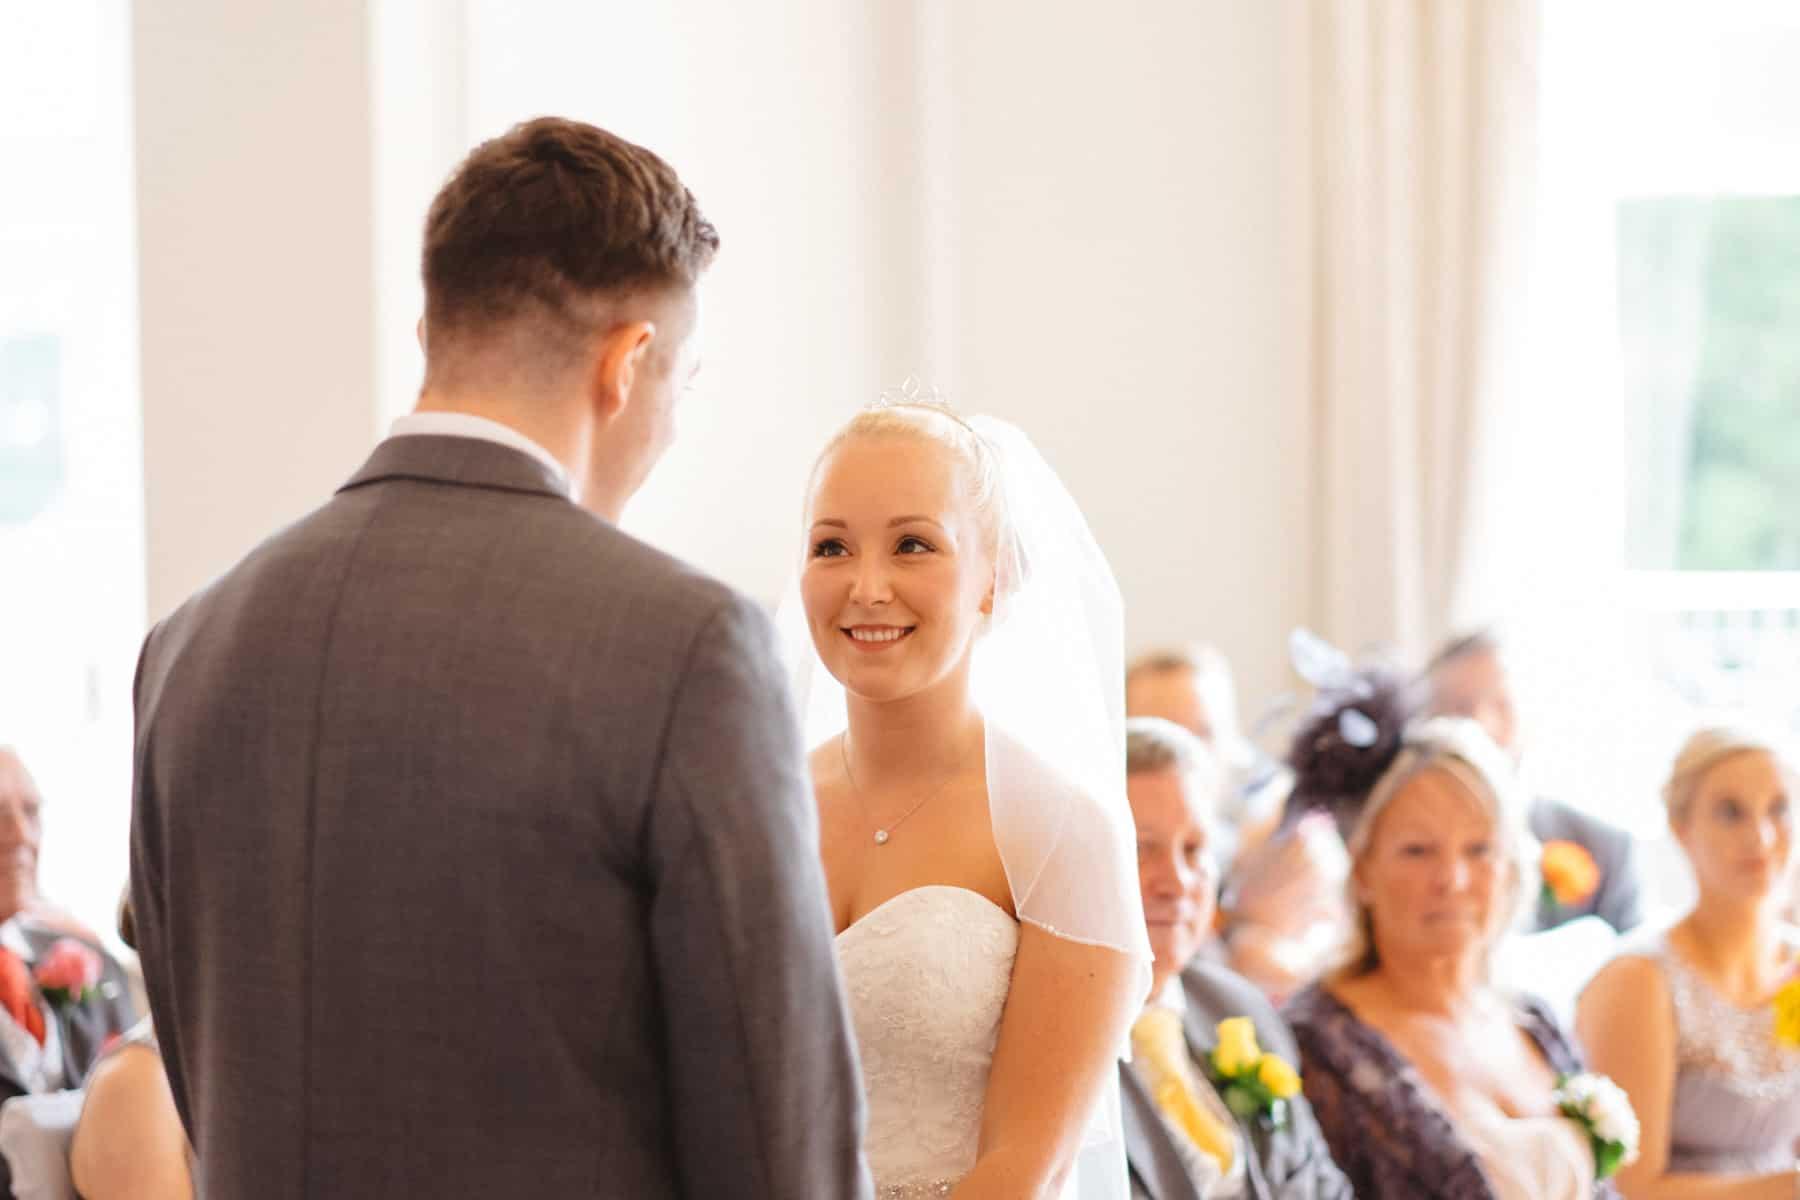 wedding photography look of love (1 of 1)